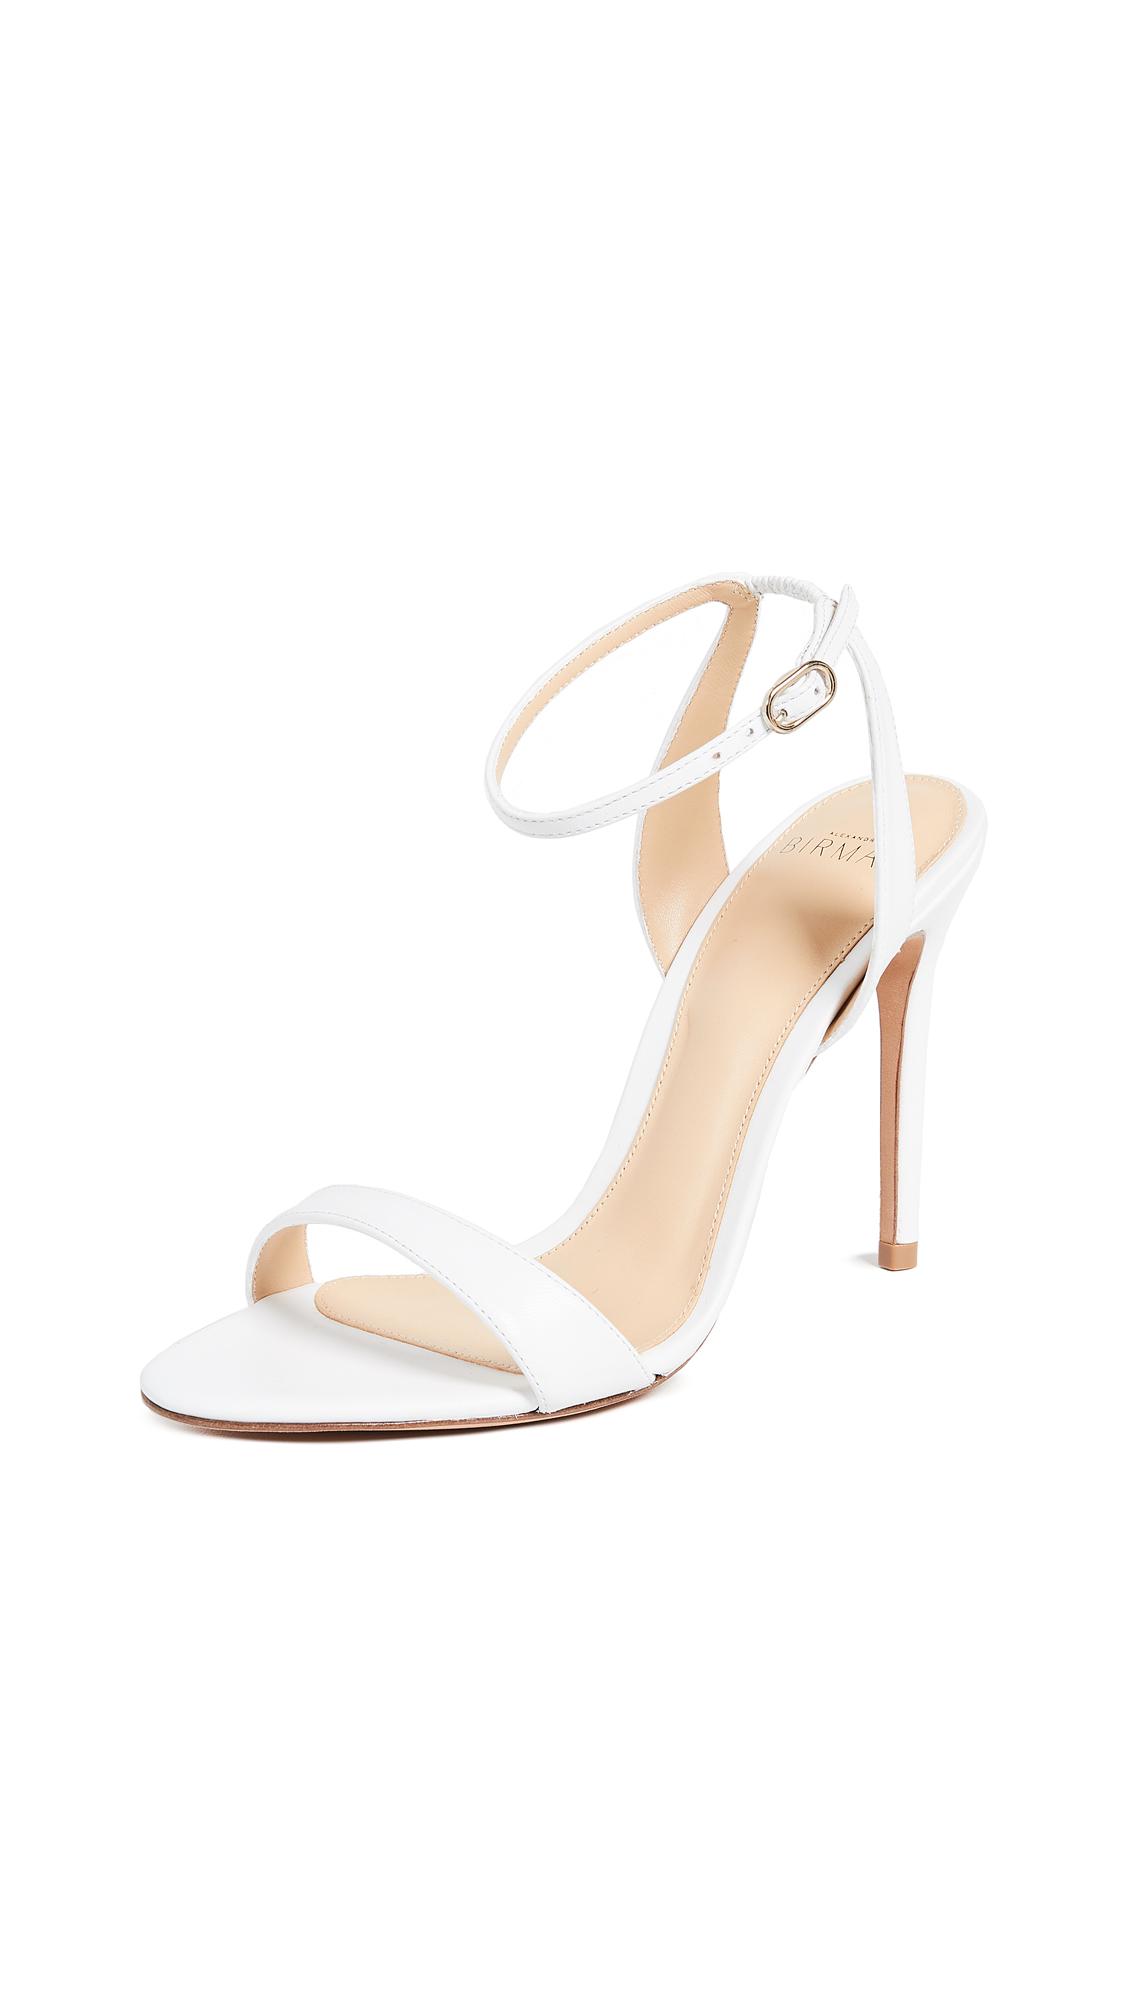 Alexandre Birman Santine Lea Sandals - White